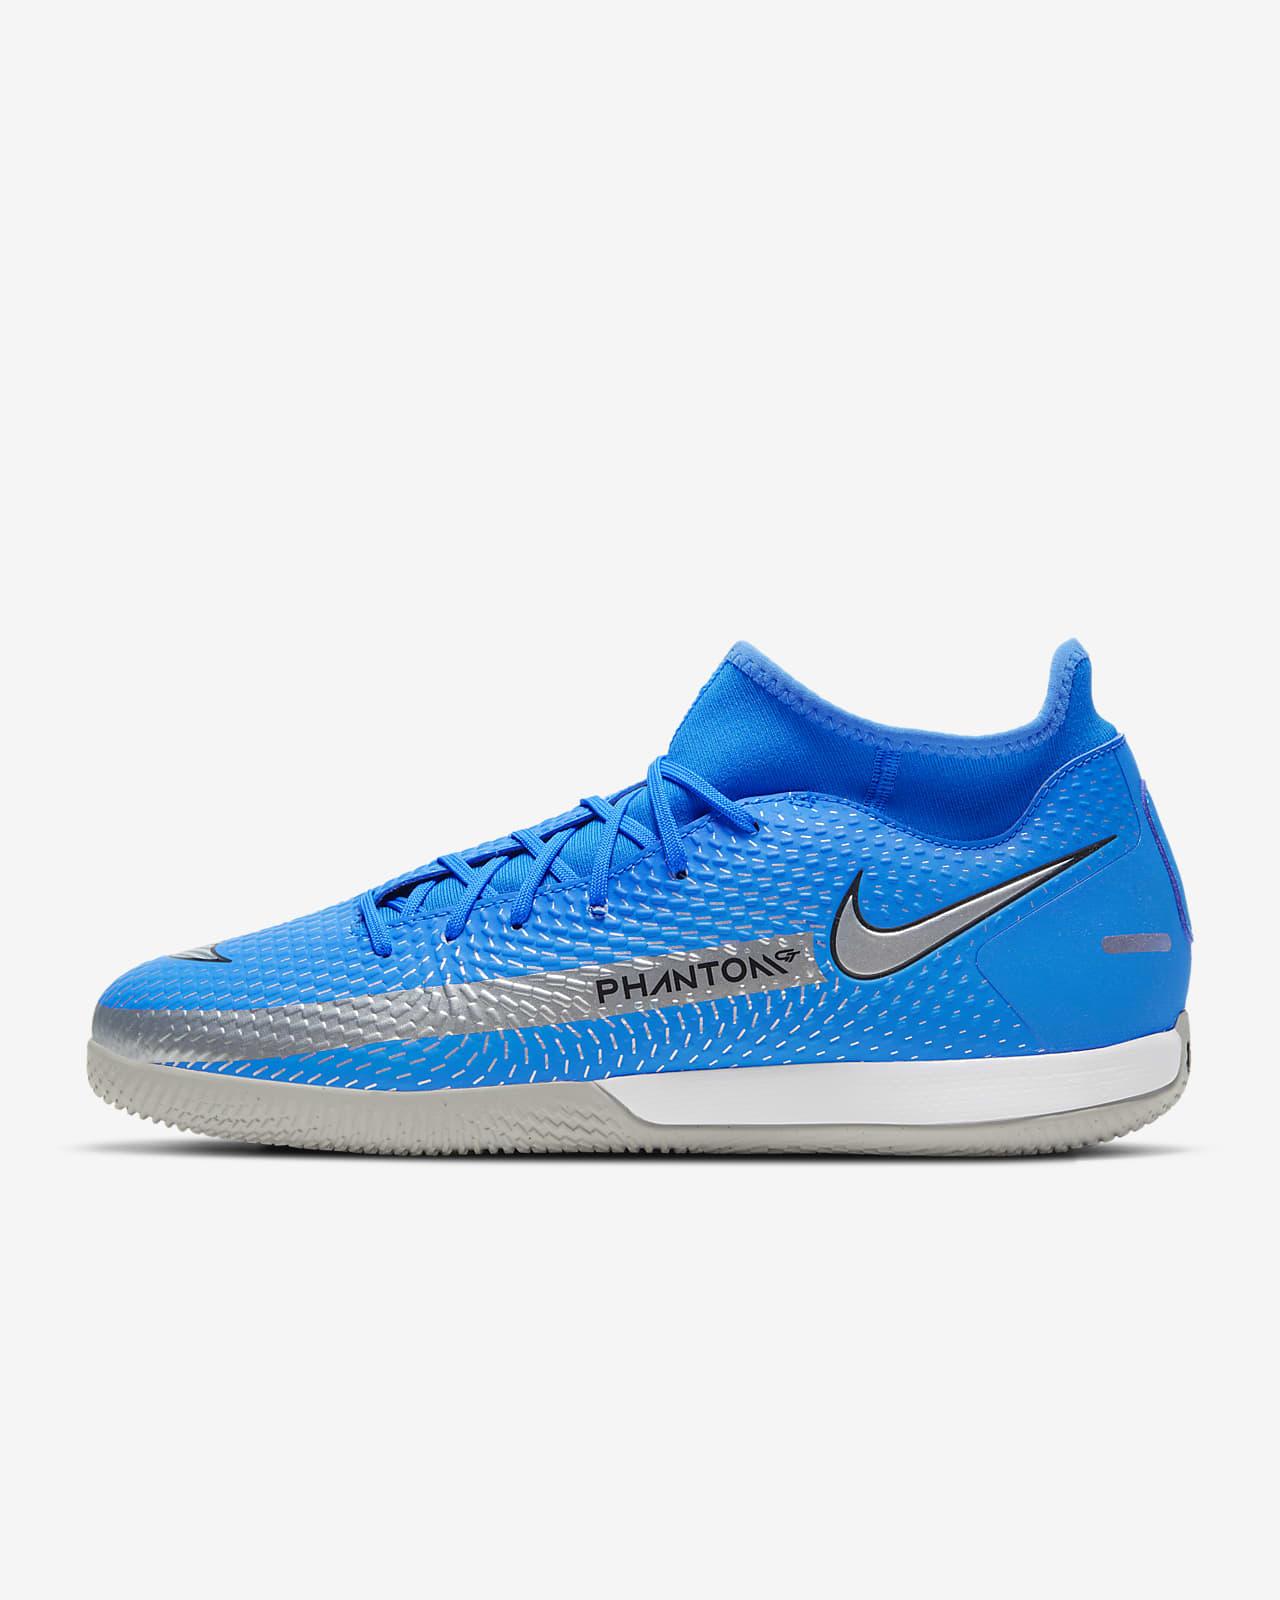 Fotbollssko för inomhusplan/futsal/street Nike Phantom GT Academy Dynamic Fit IC